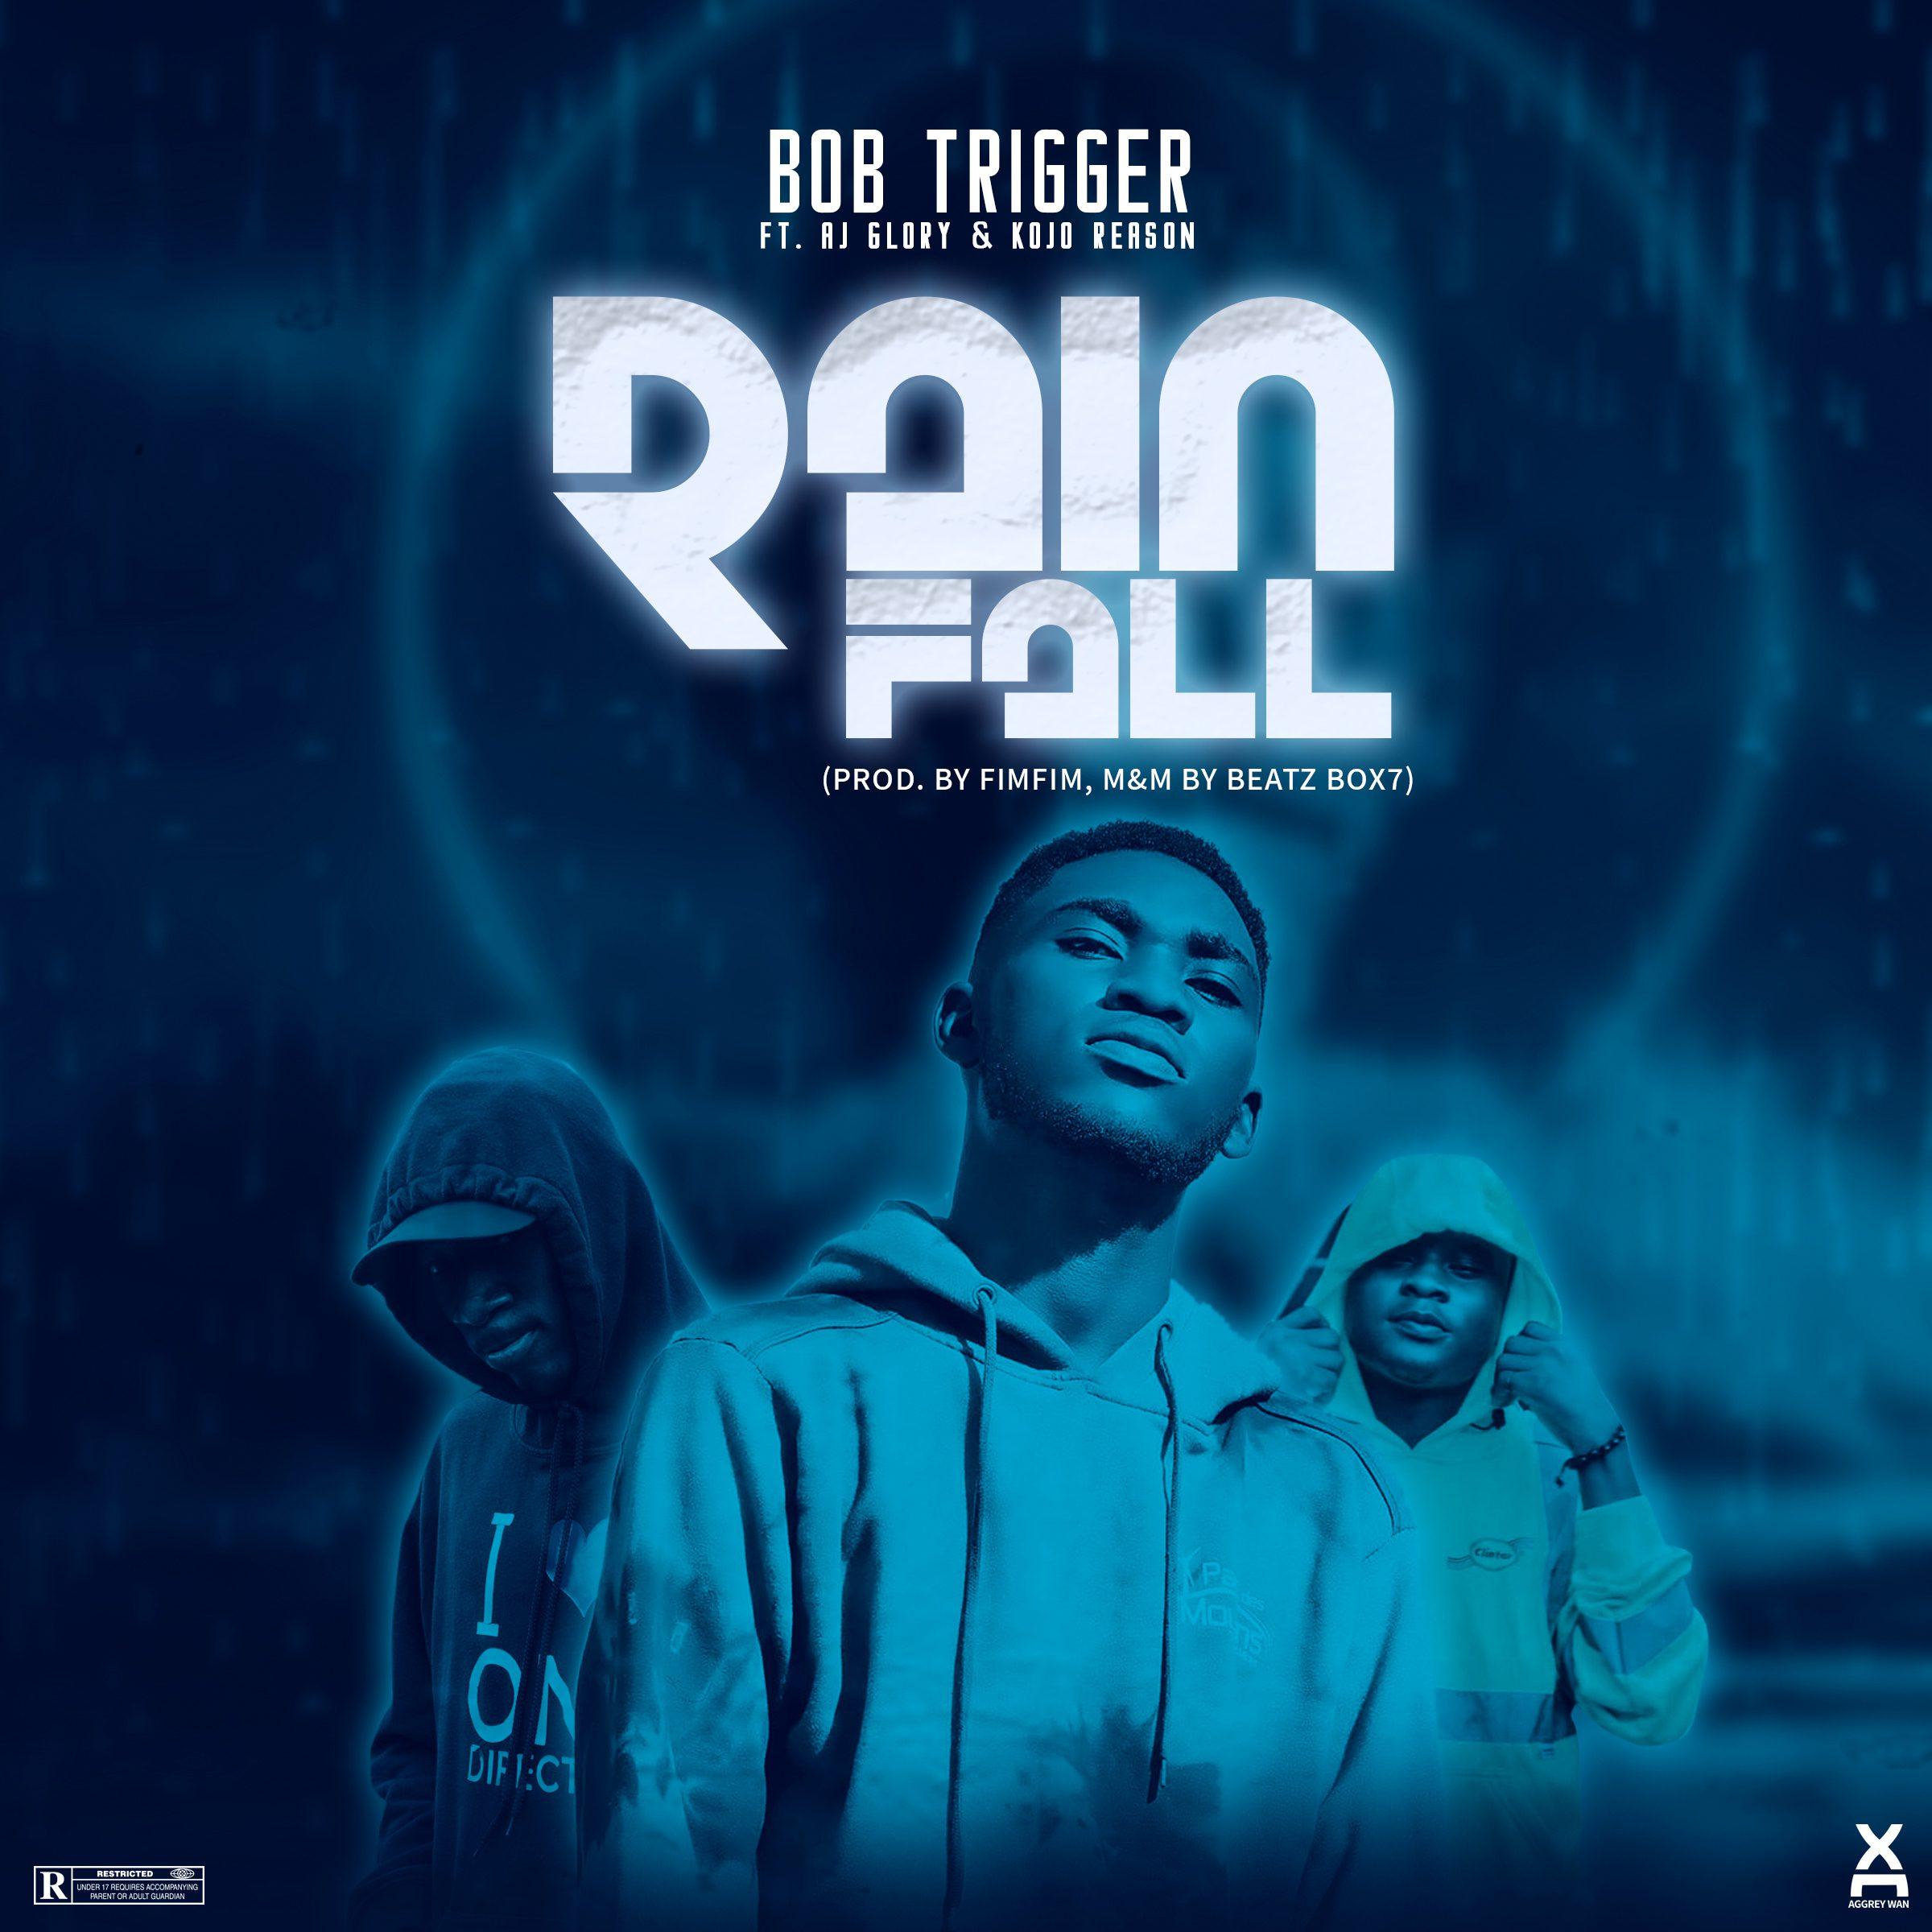 Bob Trigger – Rainfall Ft AJ Glory x Kojo Reason (Prod. By Fimfim & MM By Beatz Box7)